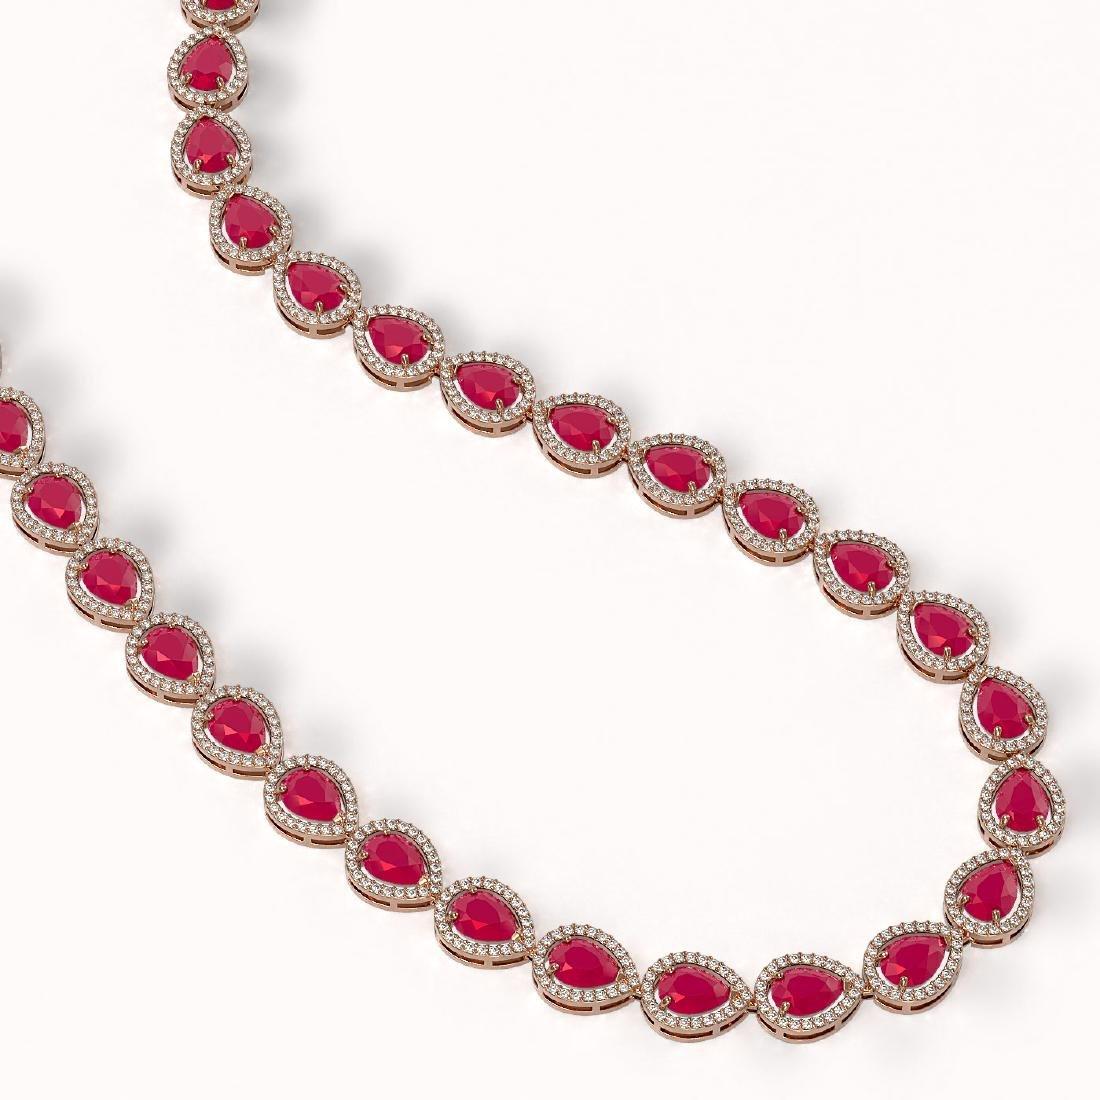 45.93 CTW Ruby & Diamond Halo Necklace 10K Rose Gold - 2